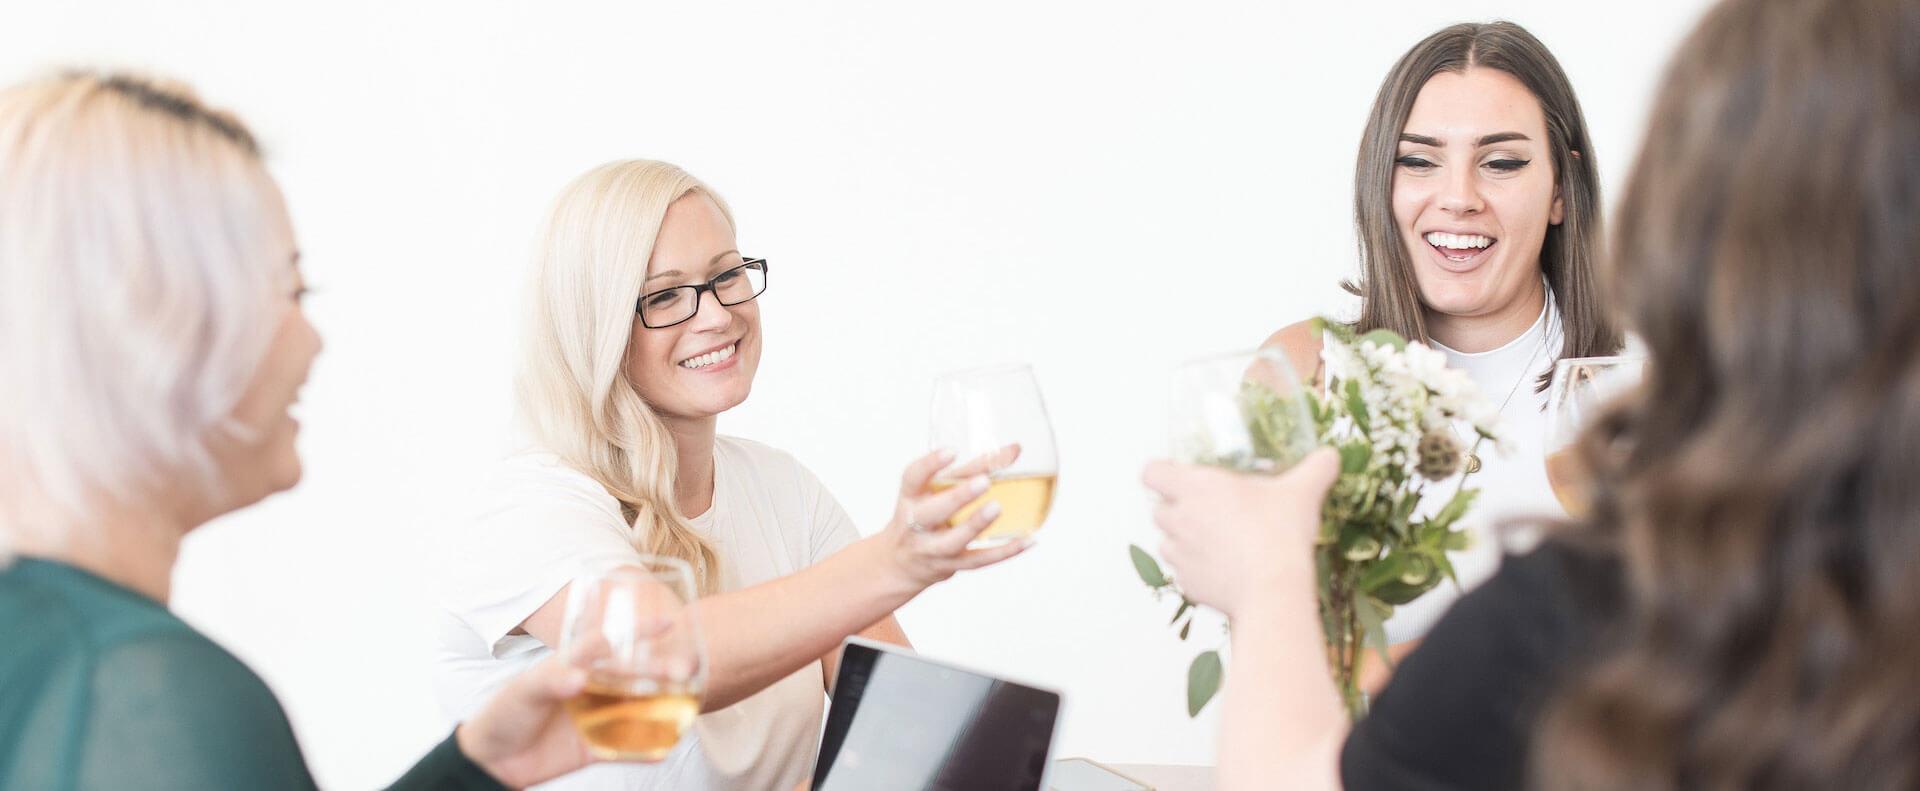 Four women (White Canvas Design Team) having a drink around the table - White Canvas Design